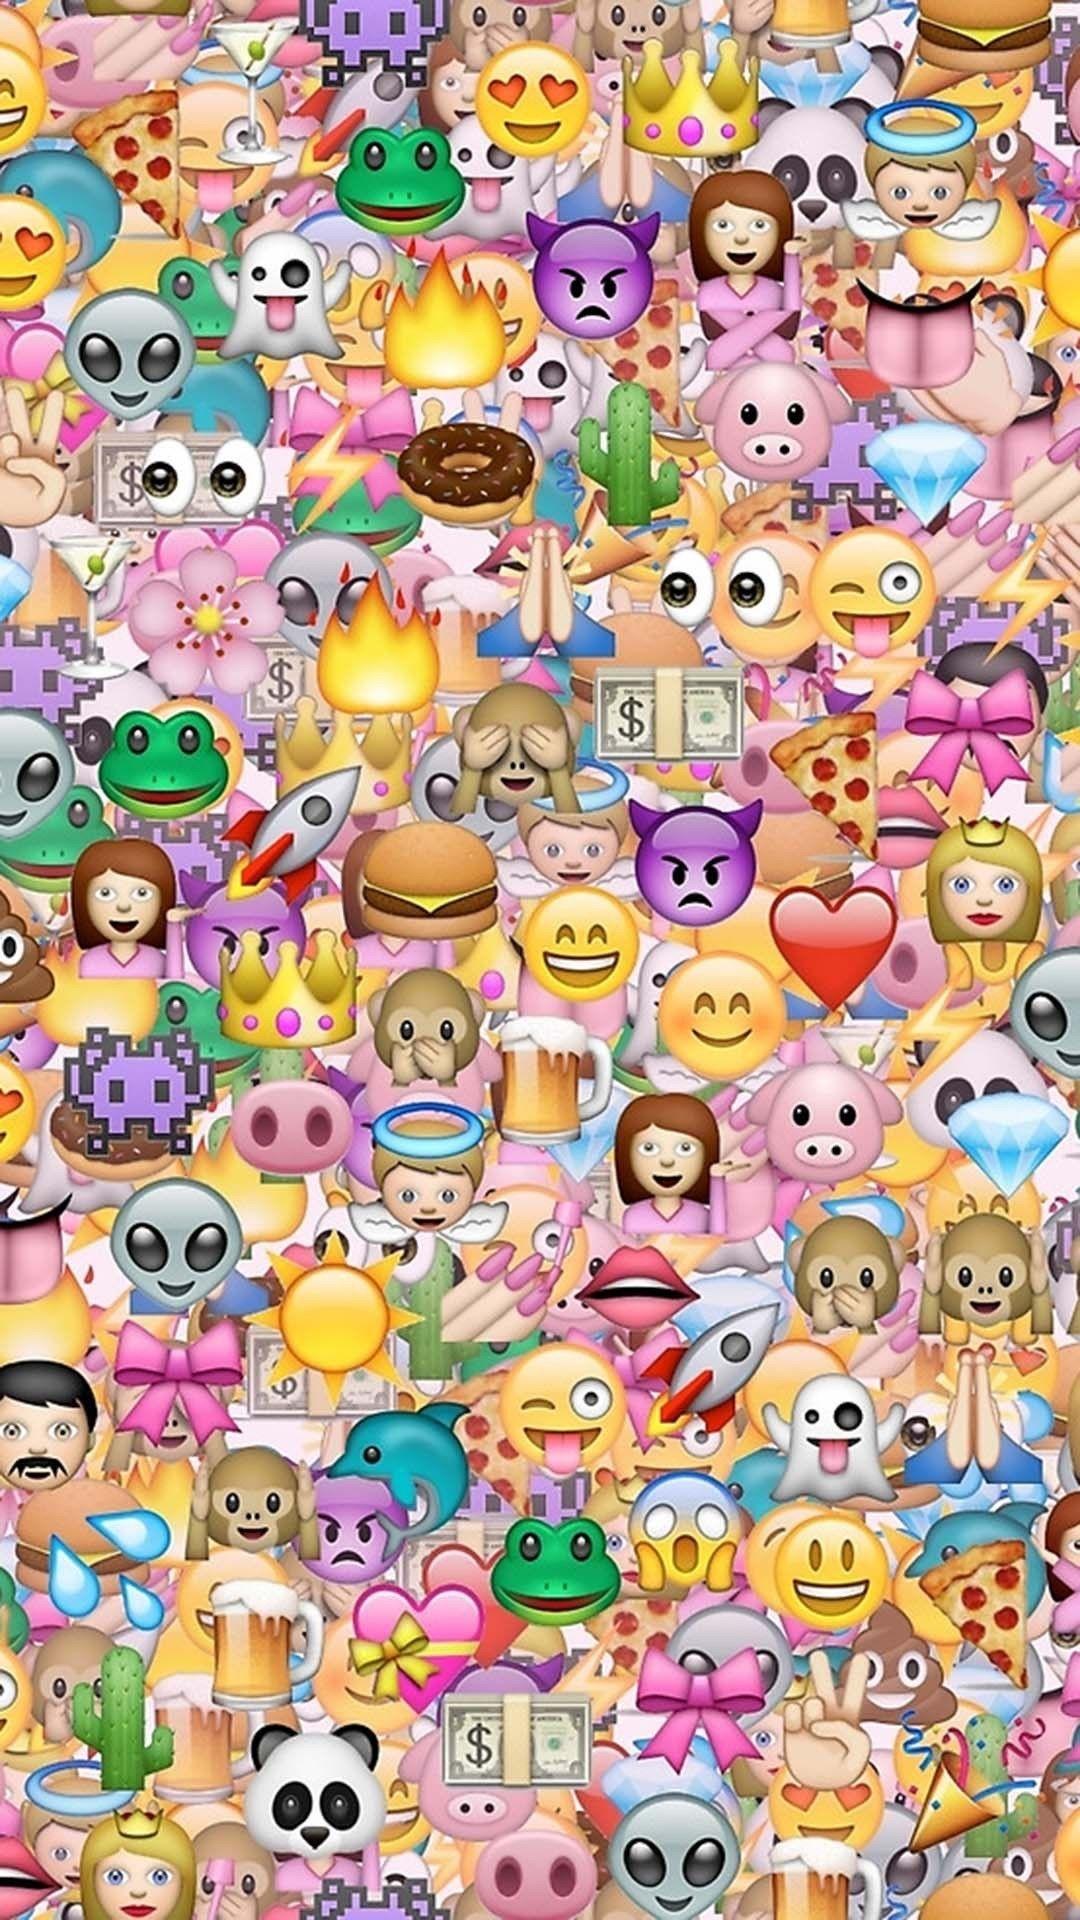 Emoji Wallpaper 1080p » Hupages » Download Iphone